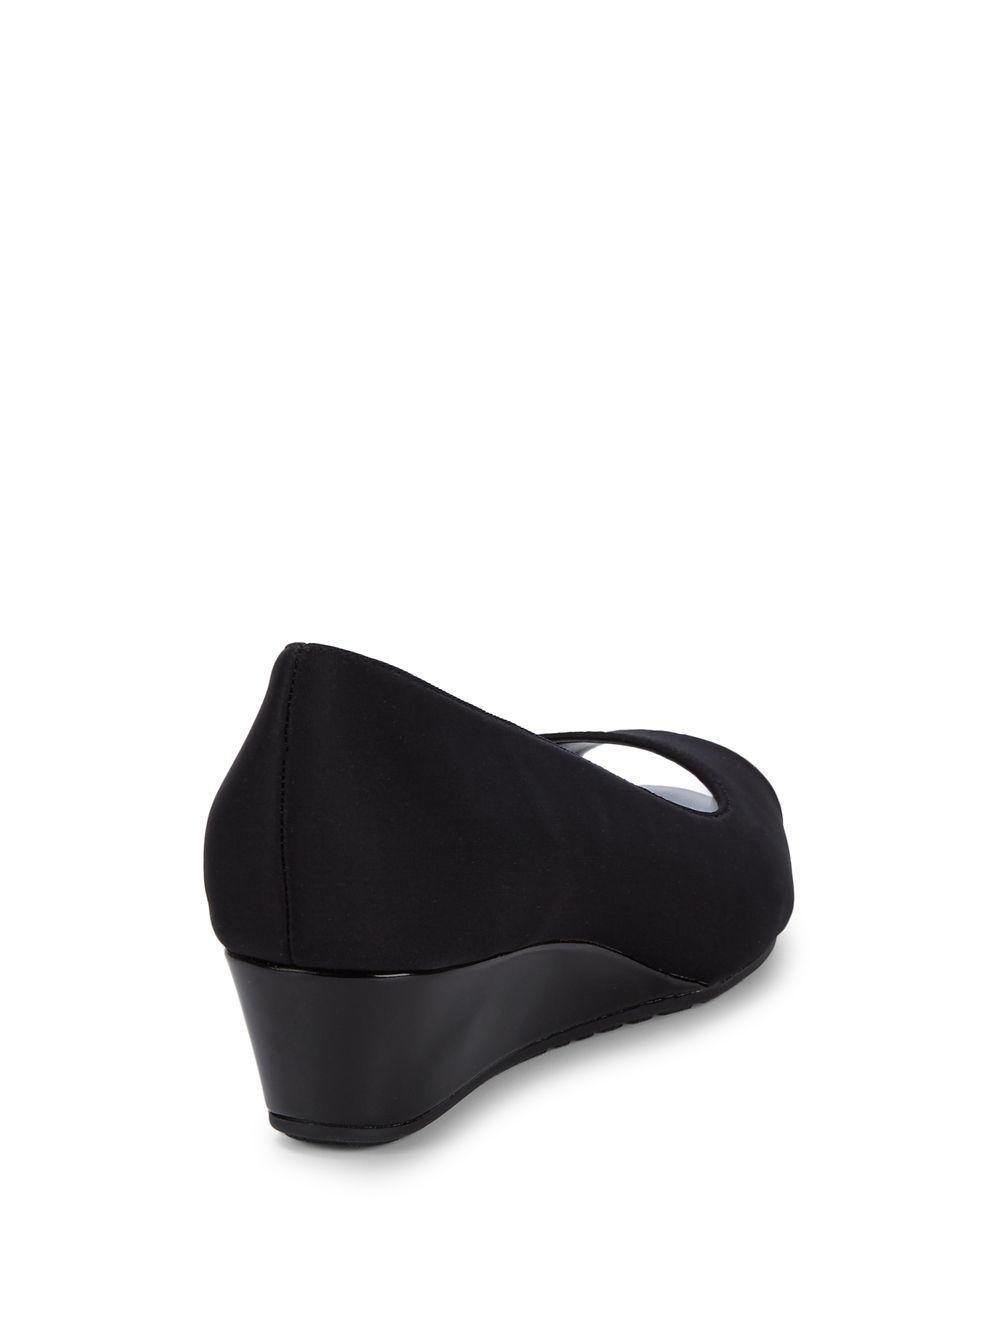 74419dedc418 Bandolino - Black Candra Peep-toe Demi-wedge Pumps - Lyst. View fullscreen